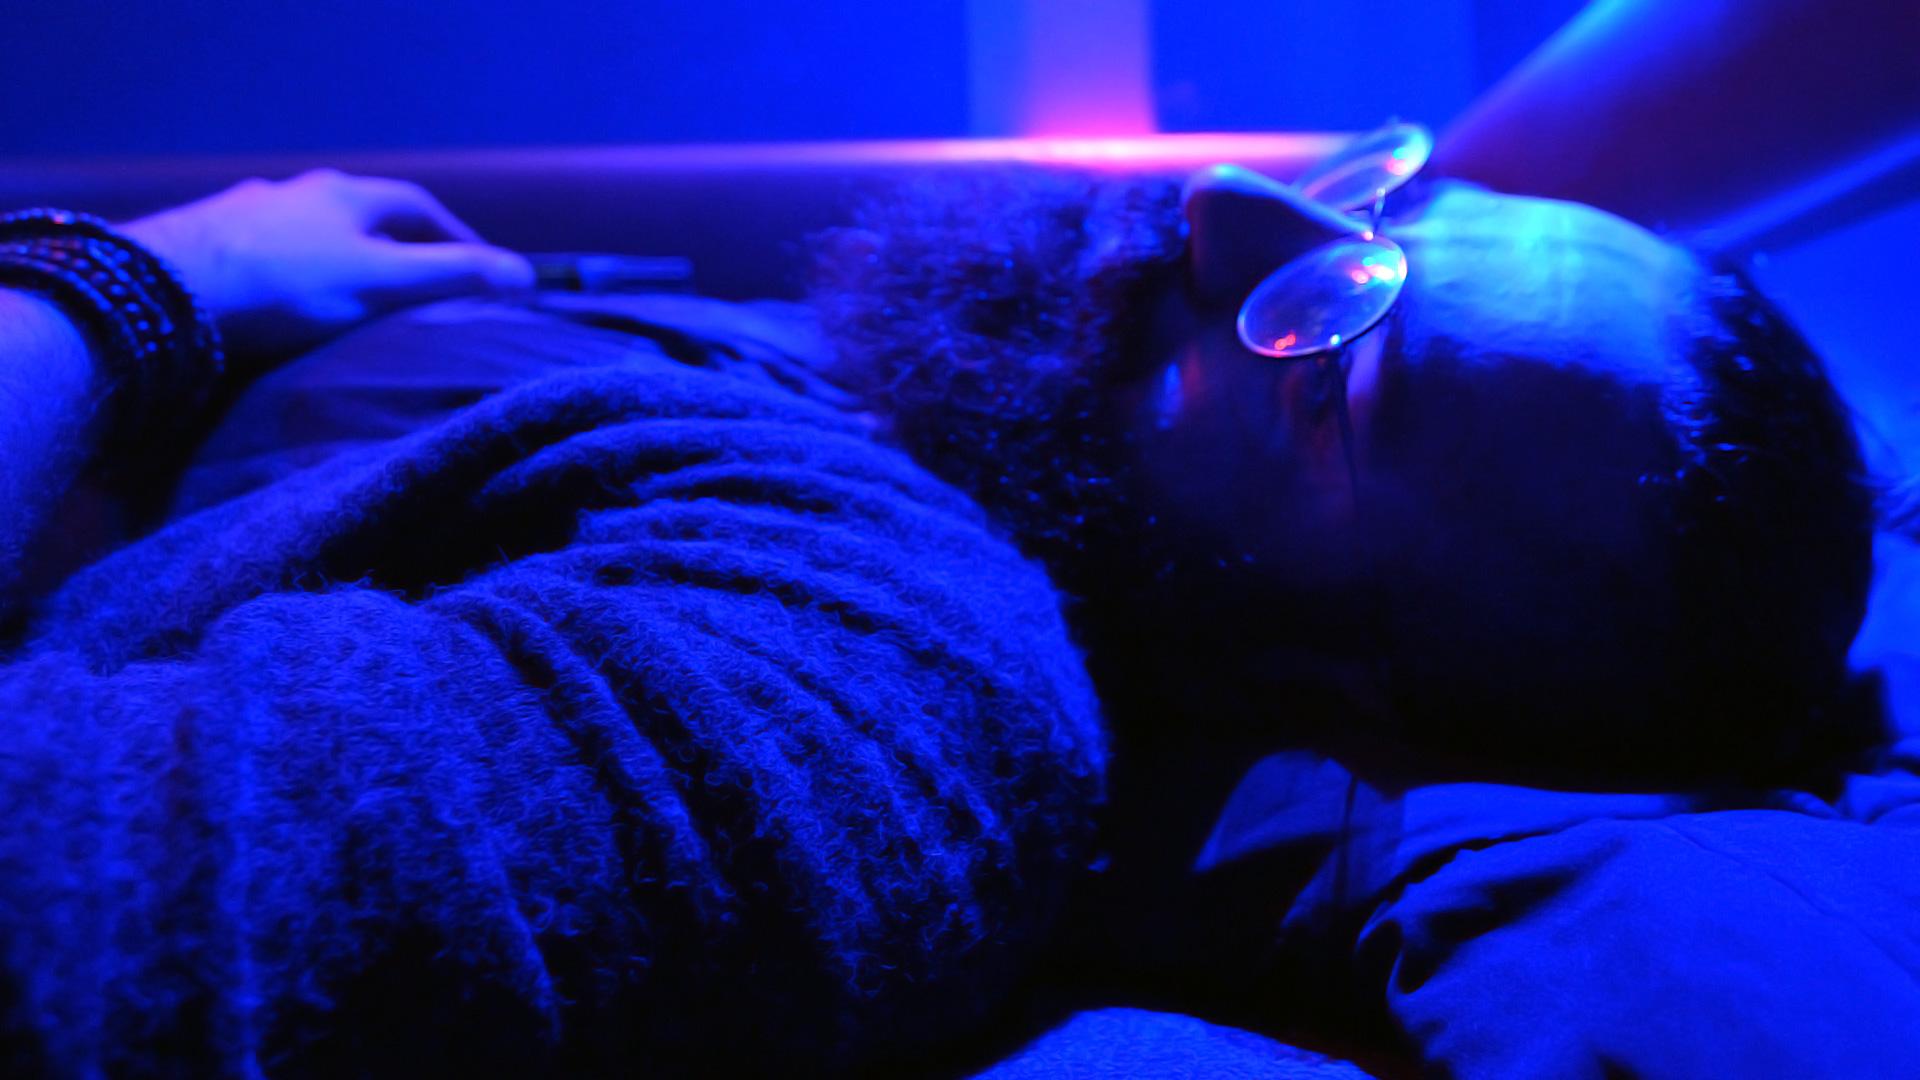 Shahin Najafi resting before concert, in ultraviolet light